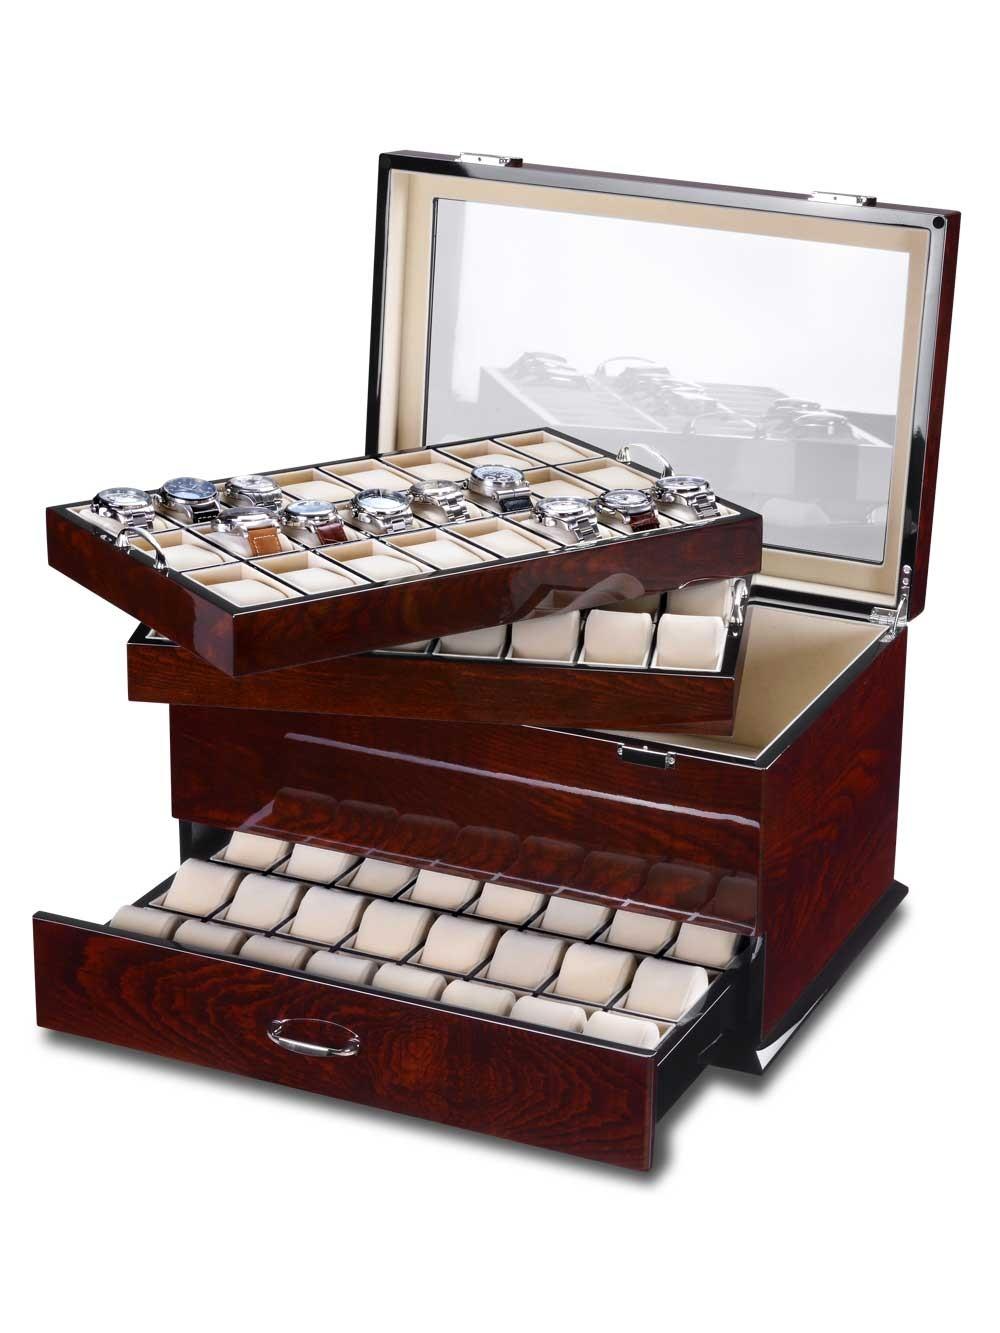 cutie ceasuri rothenschild [72) rs-5073-blw exclusive-line